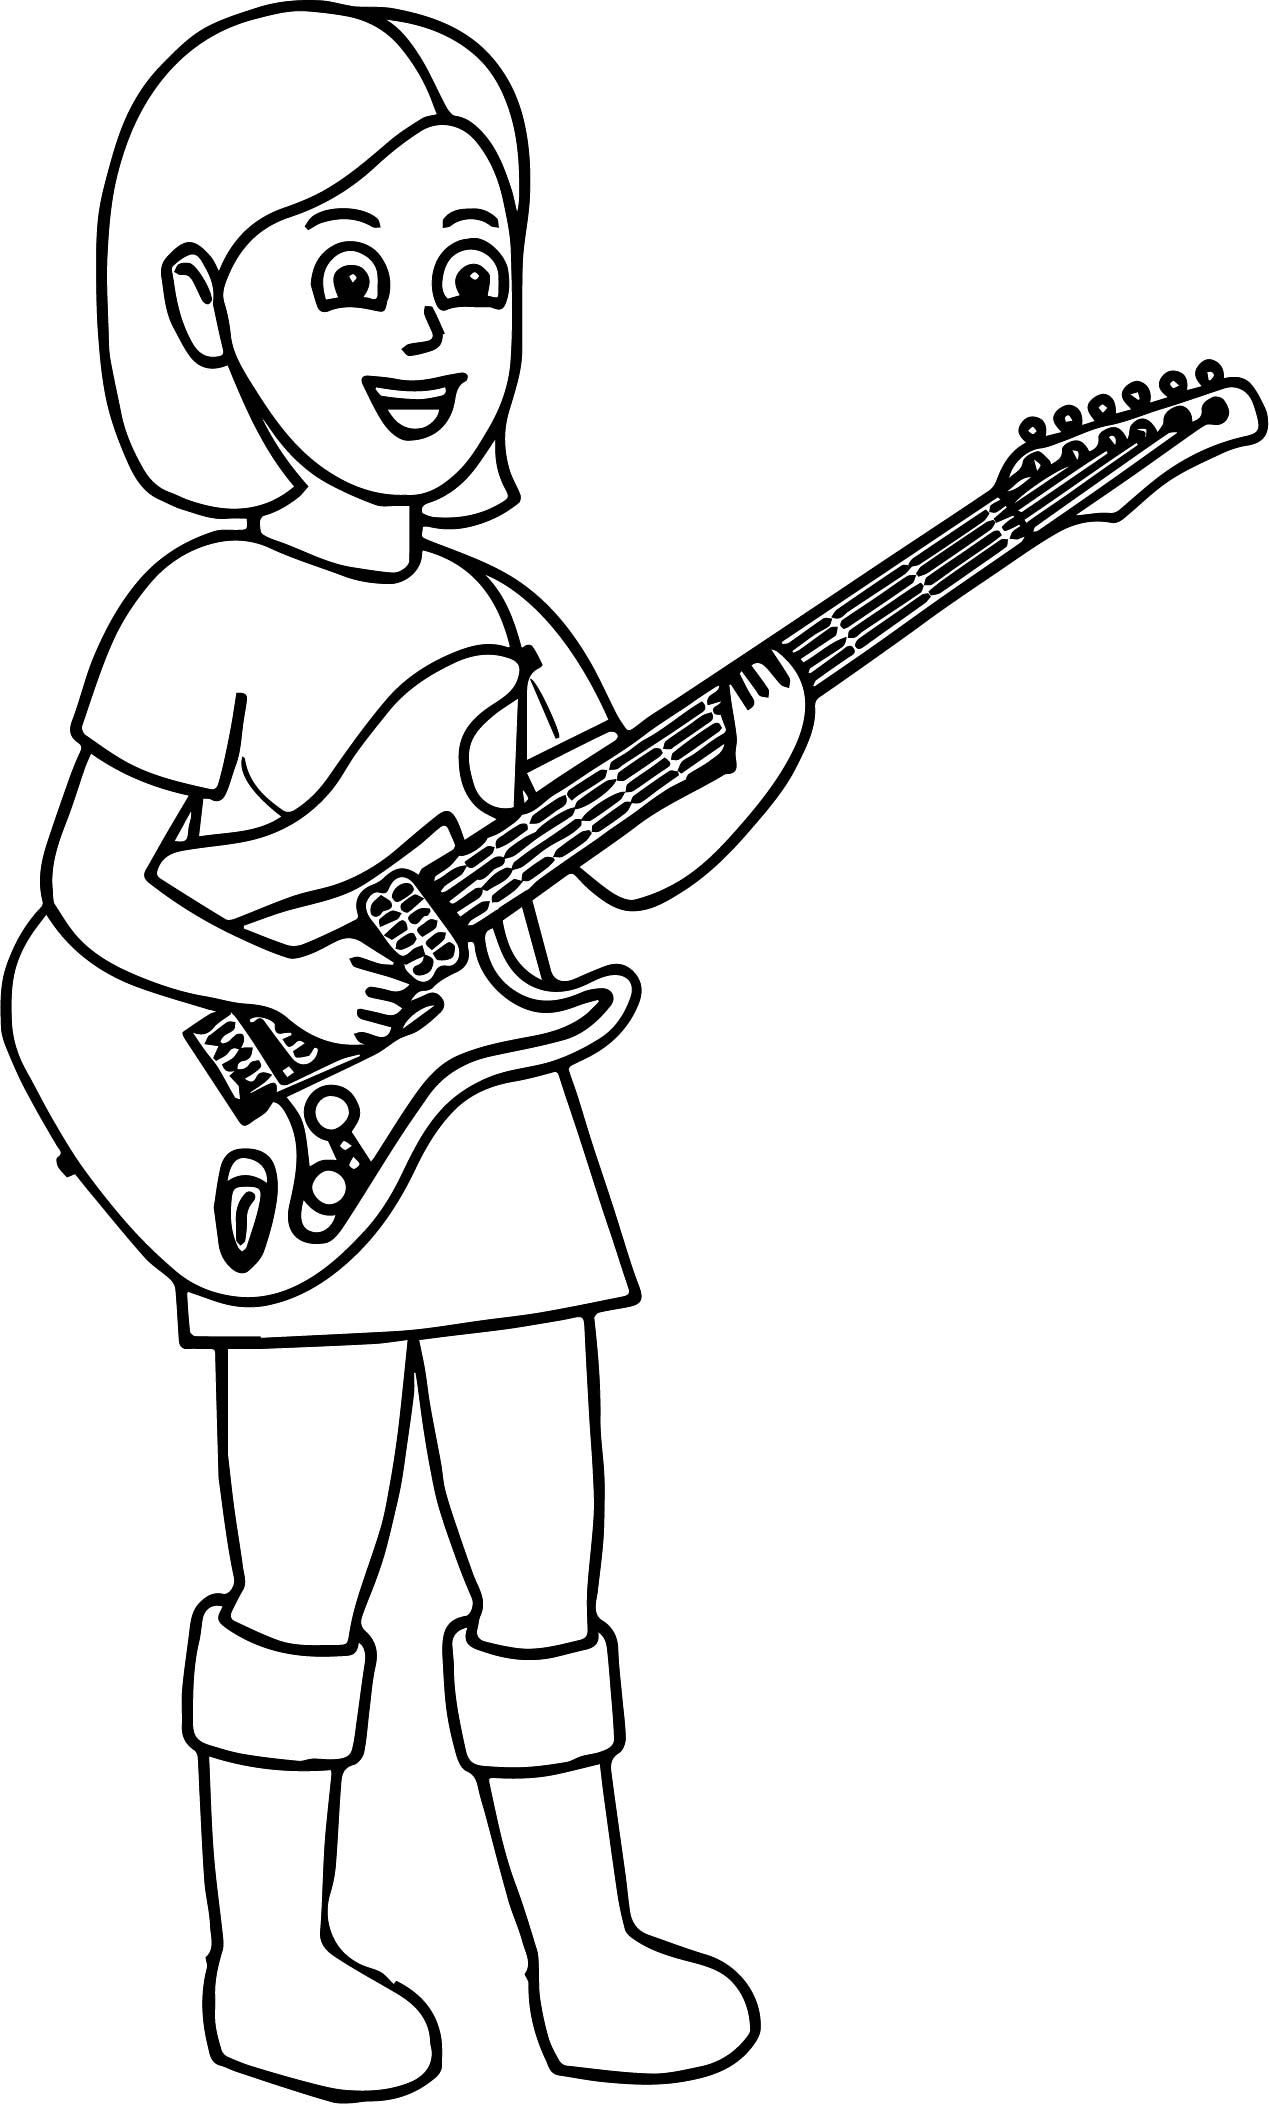 Раскраска Девушка играет на гитаре